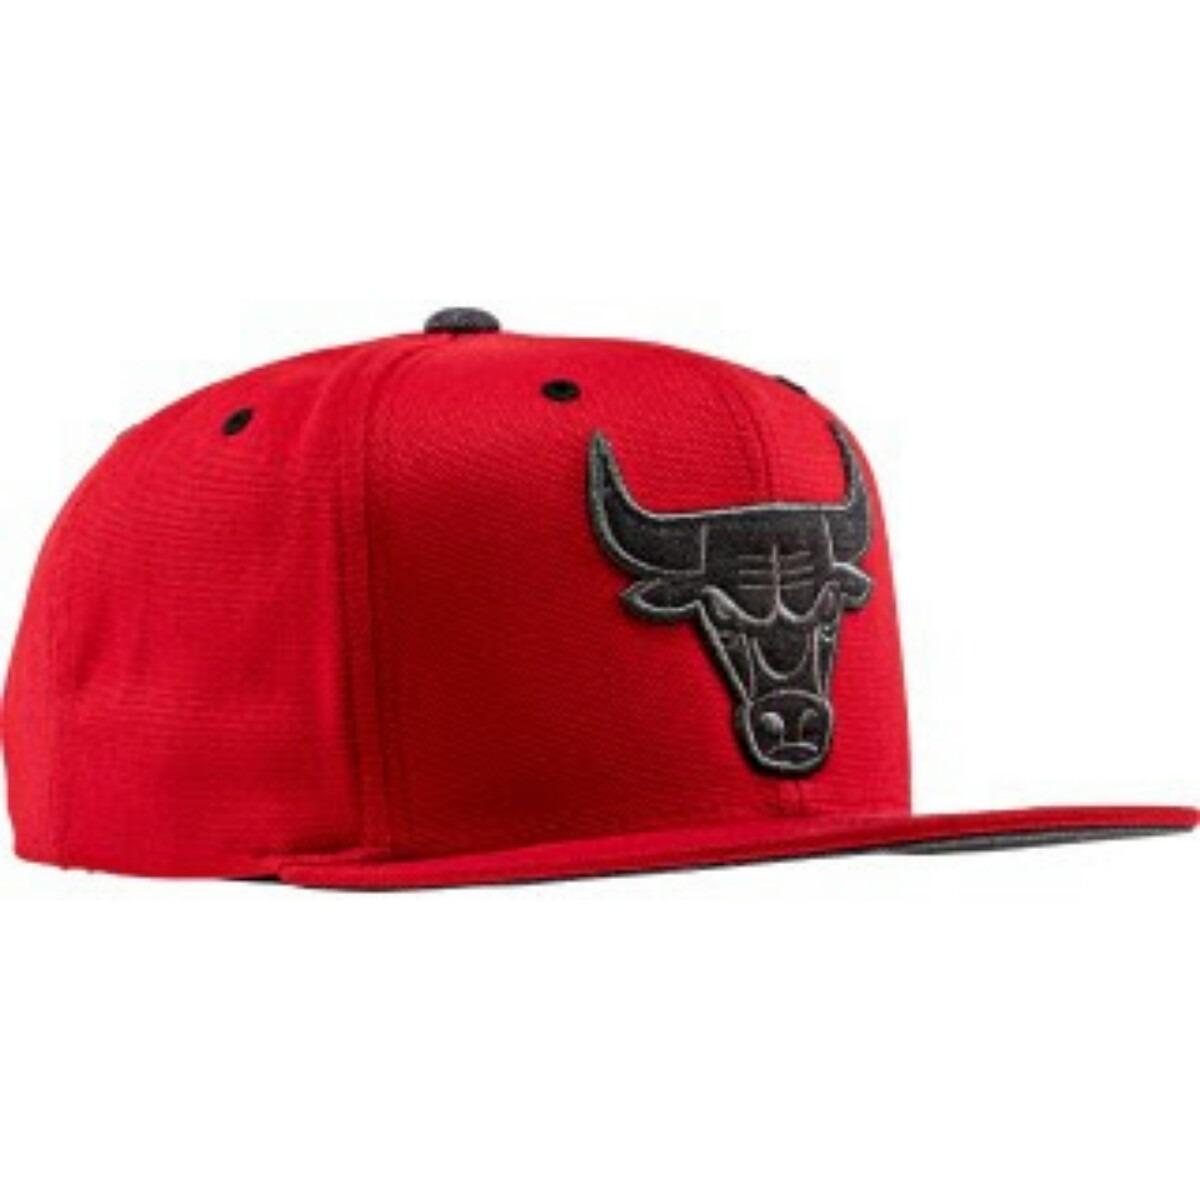 Gorras Chicago Bulls Rojas finaperf.es 62bc563ac3a